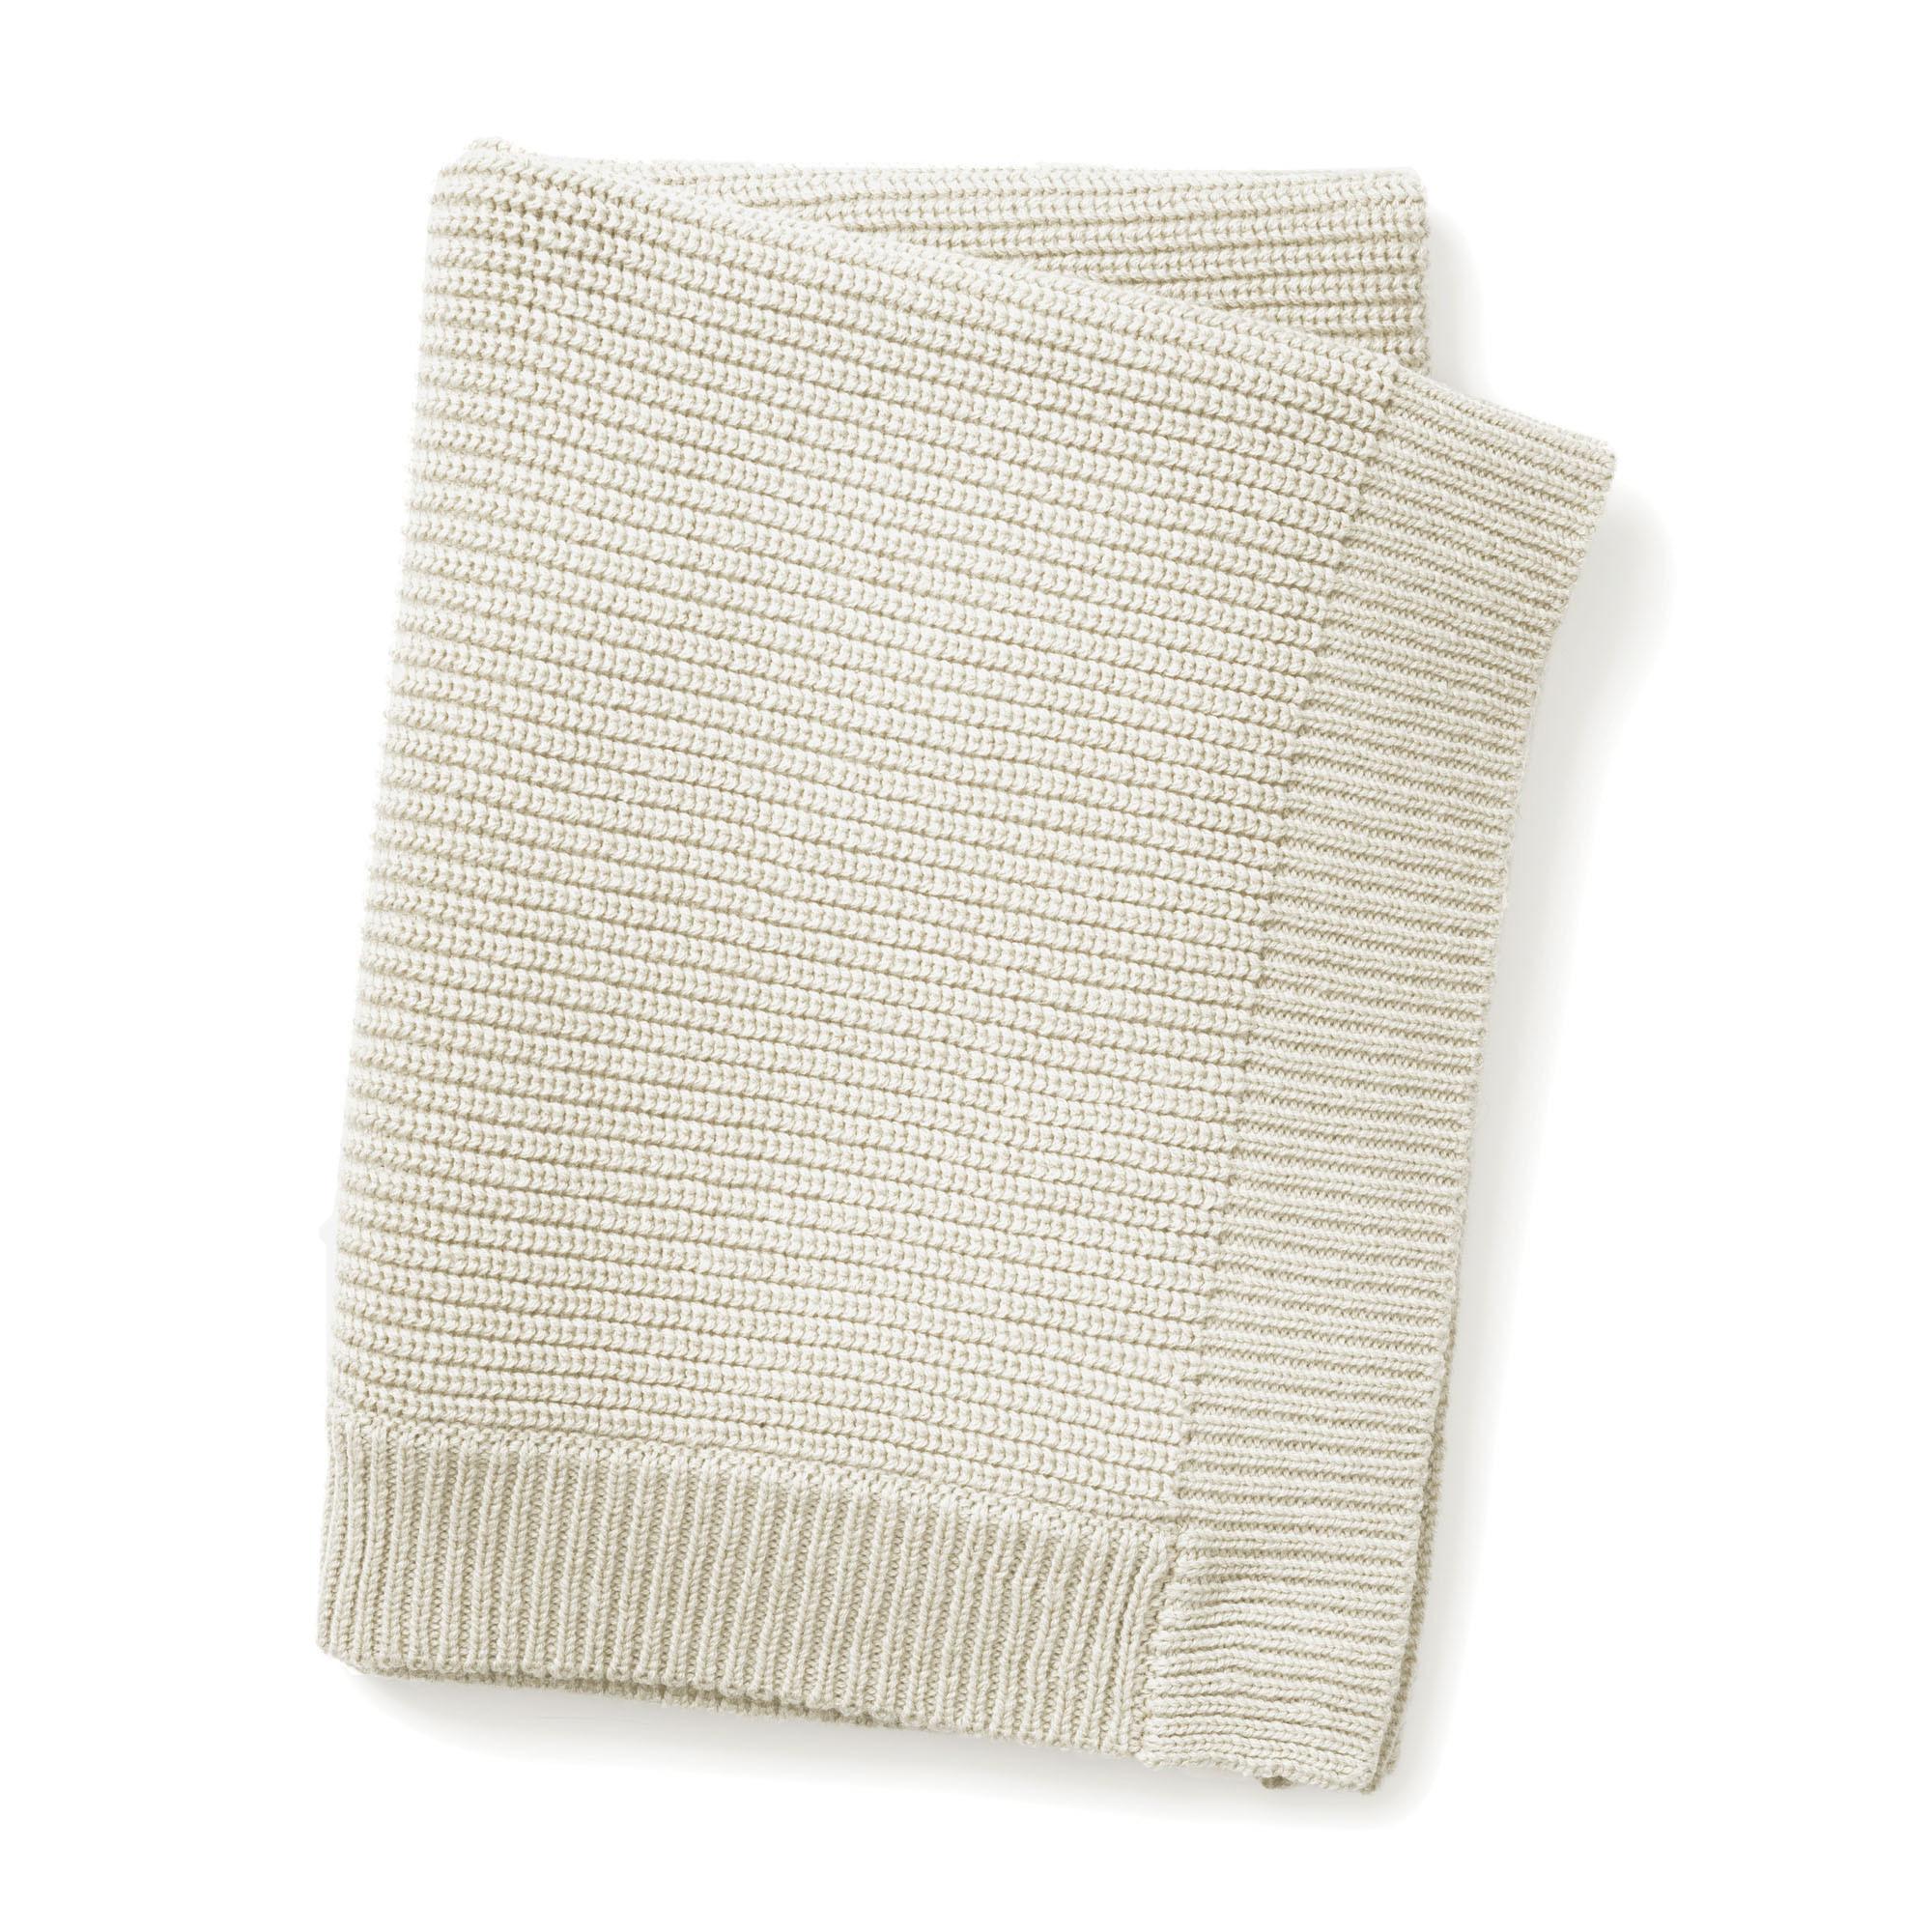 Gebreid deken vanilla white-1